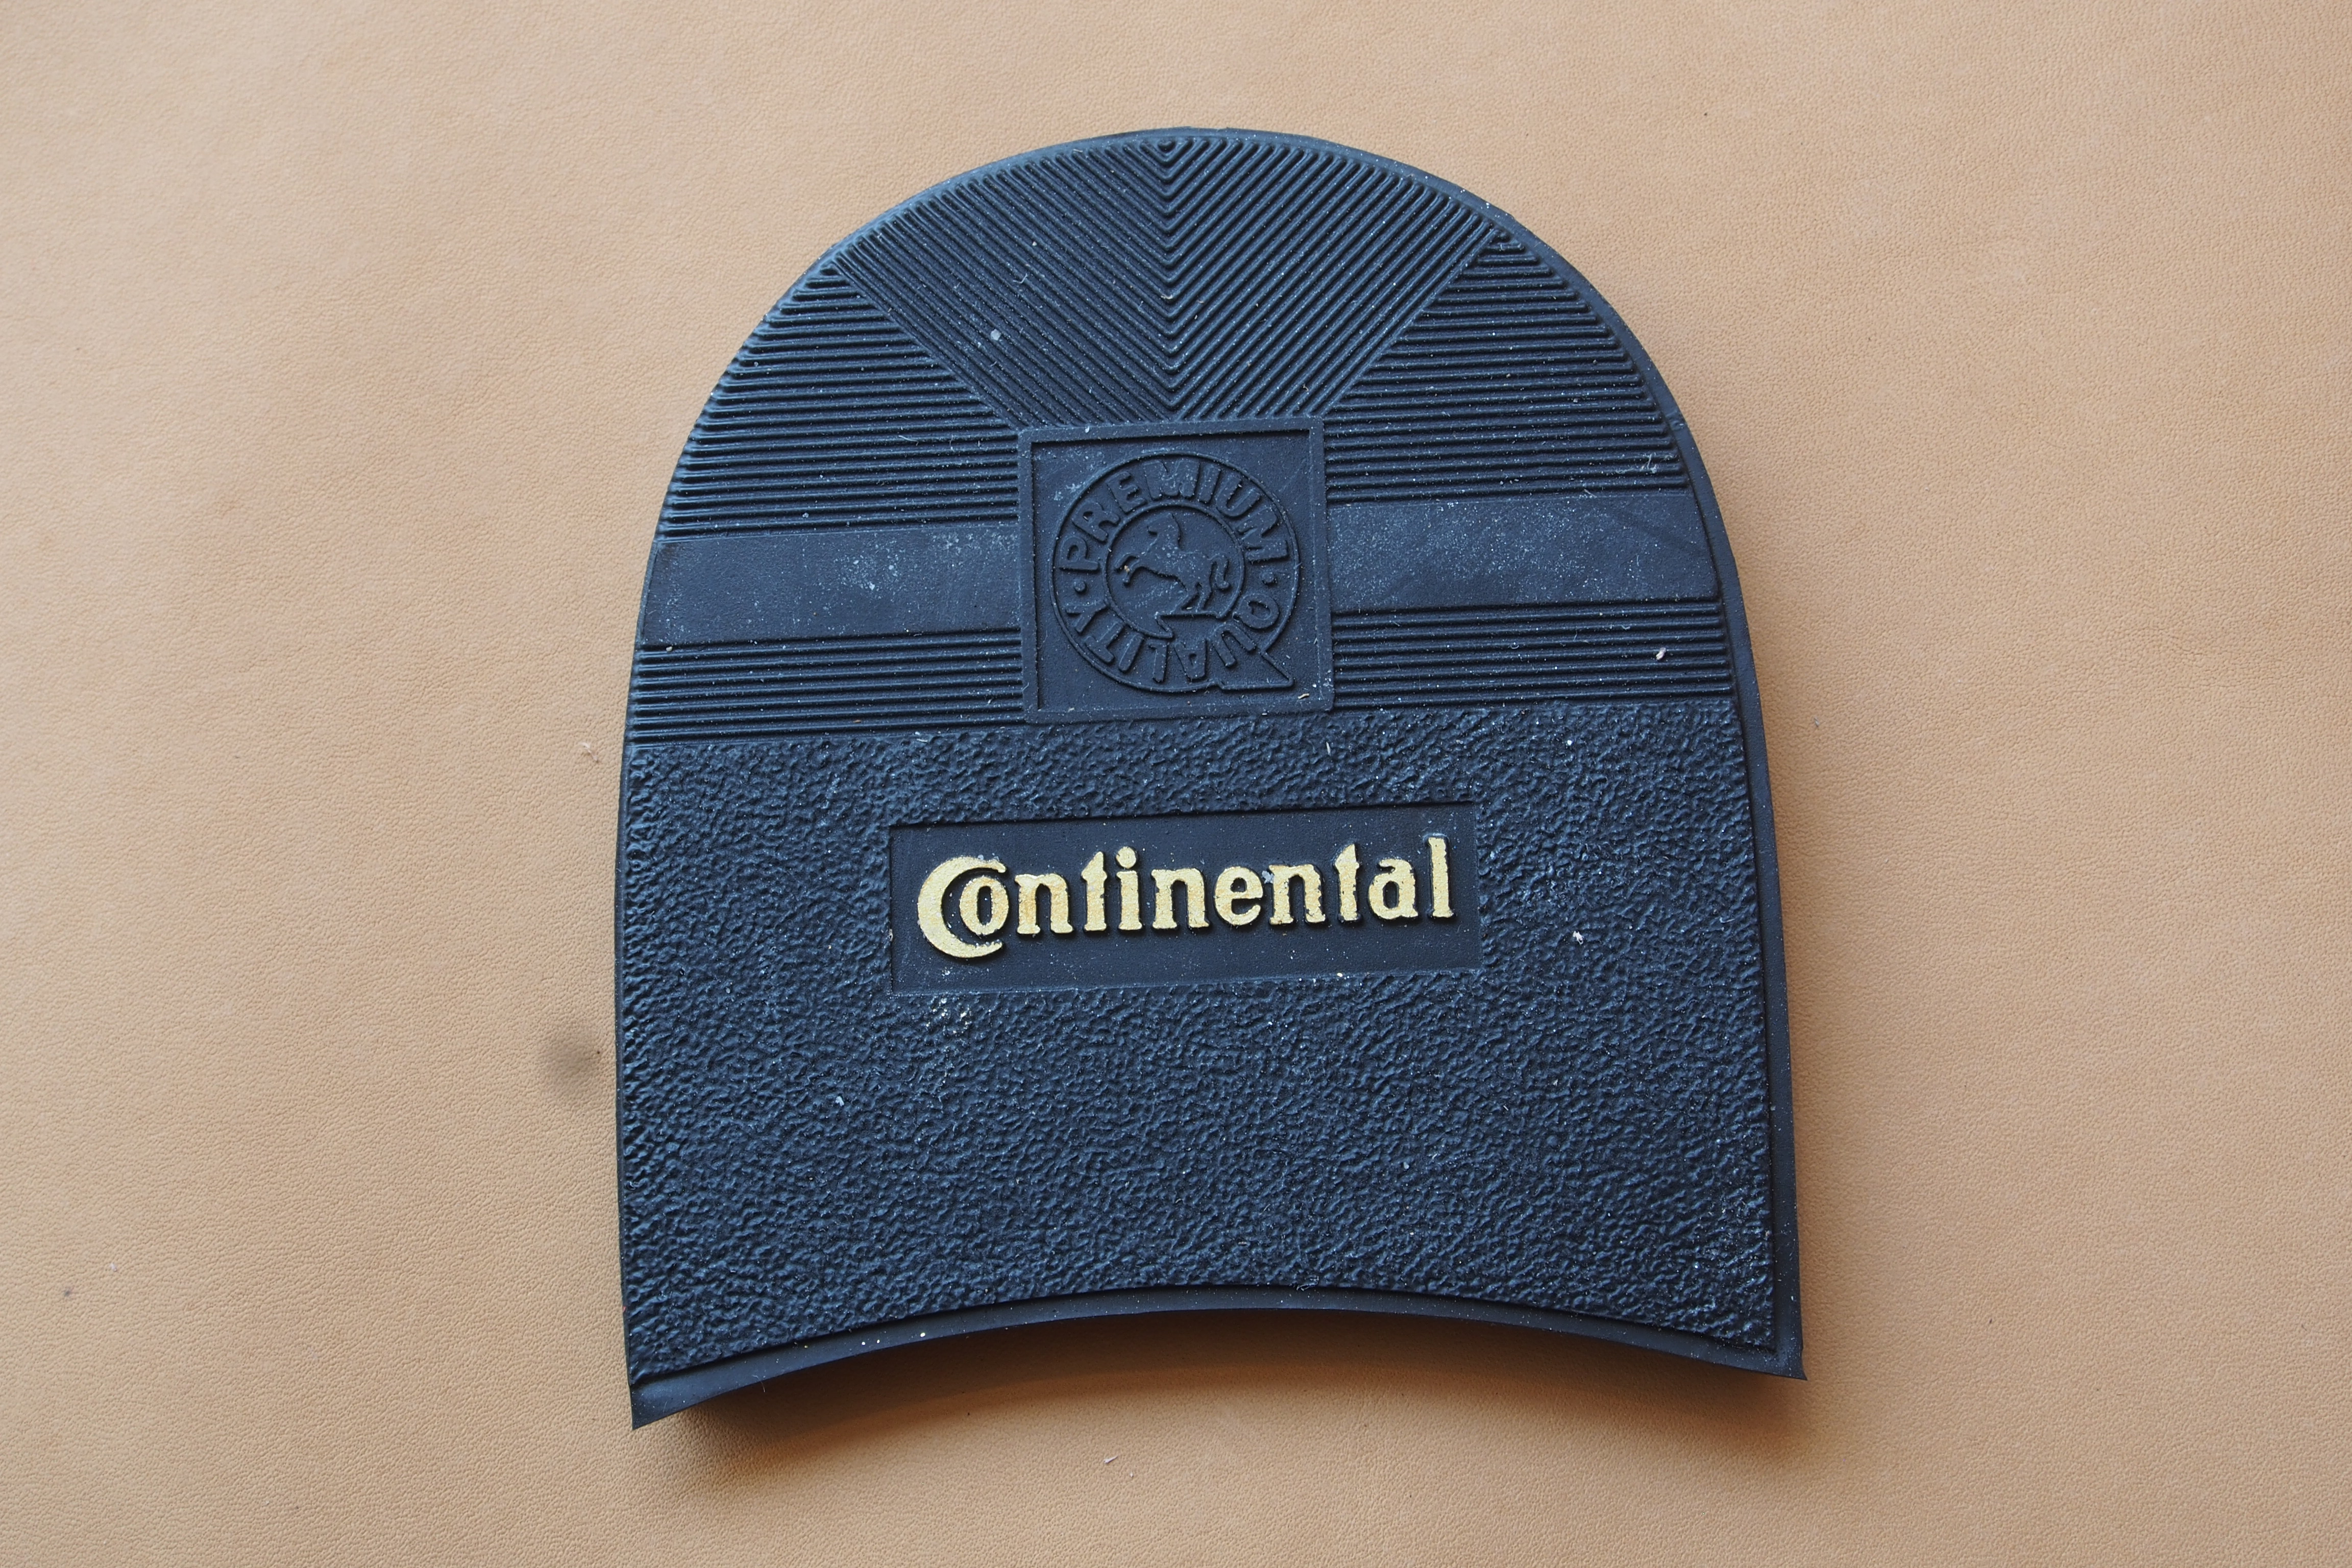 Continental heels